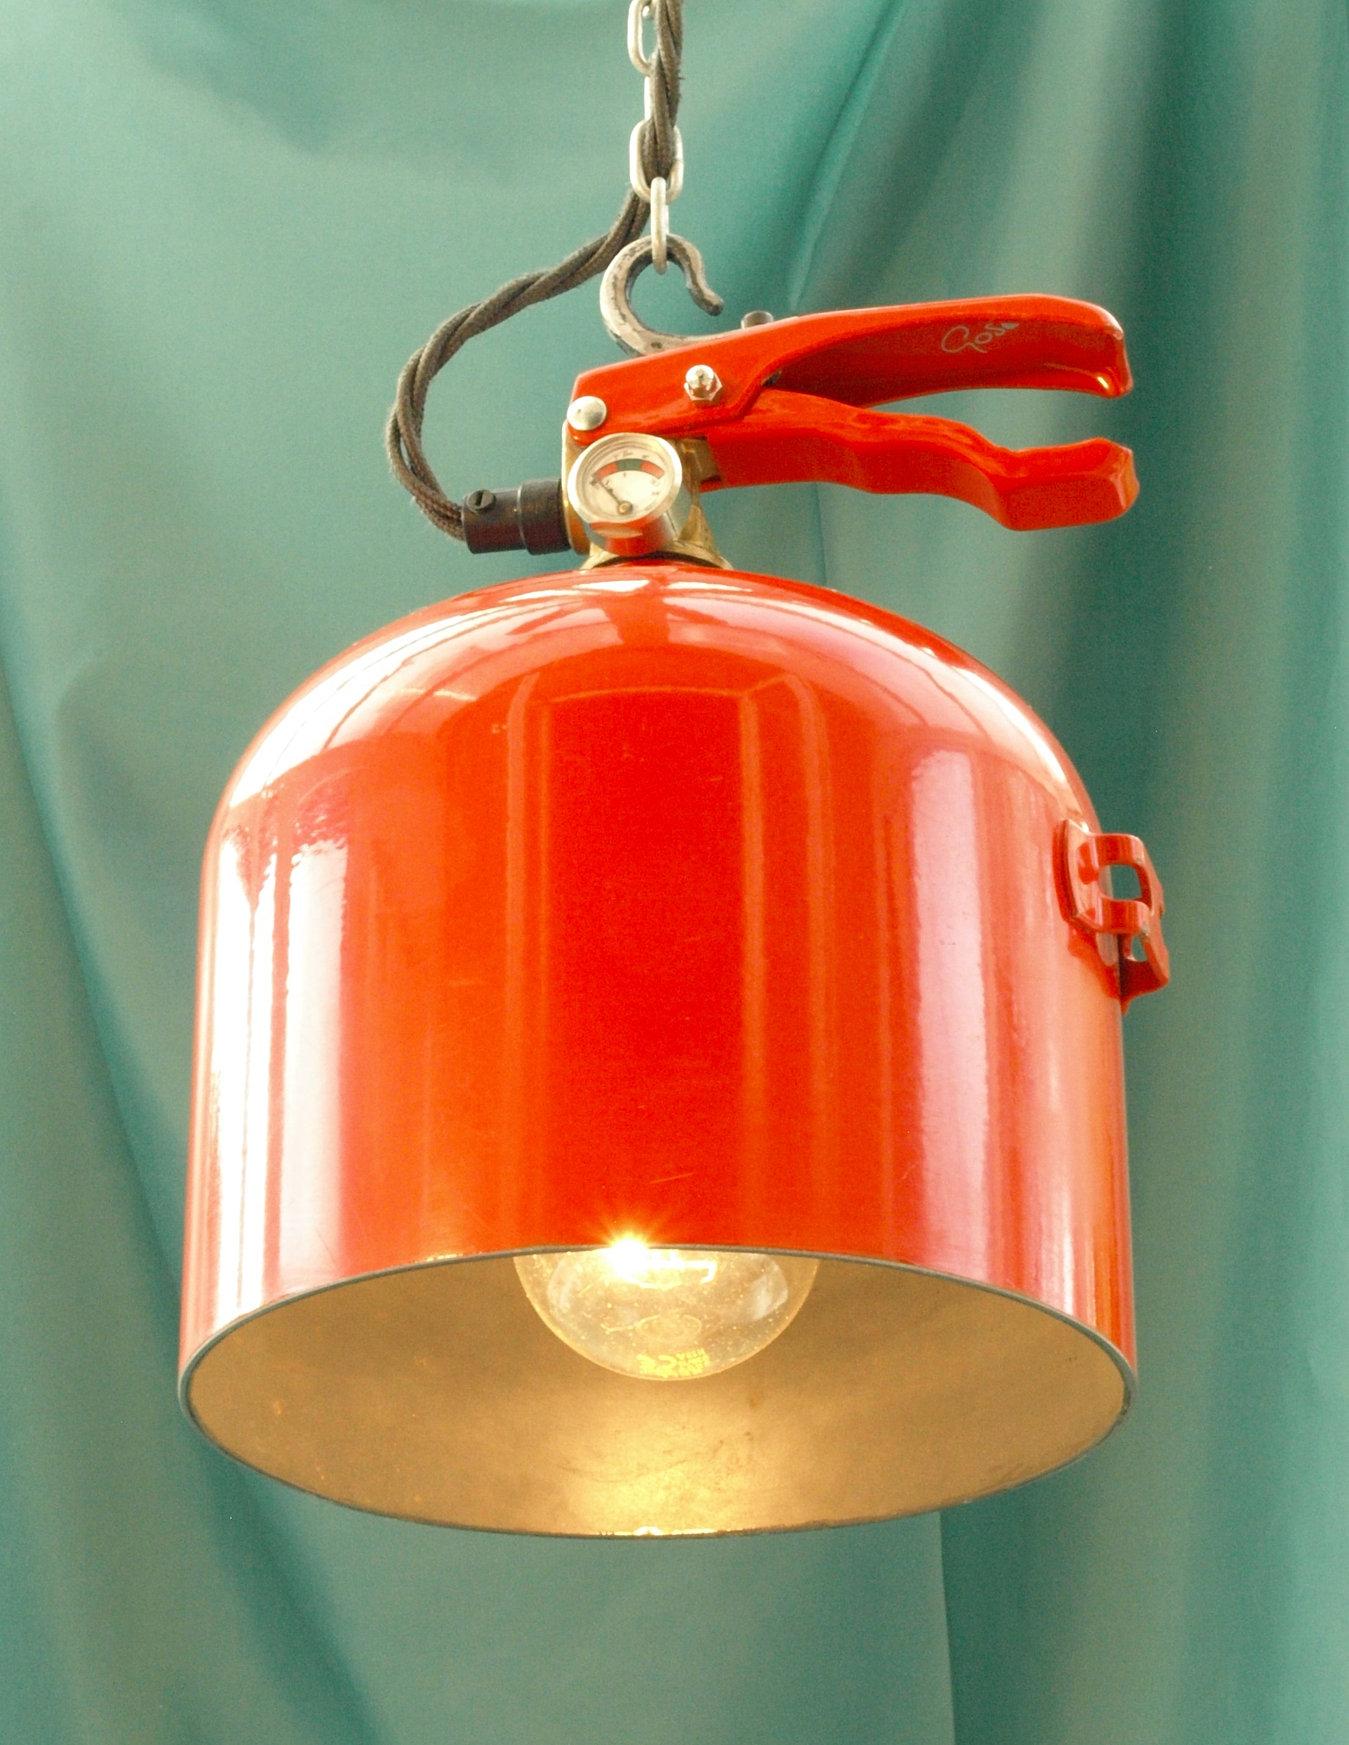 Extinguisher & Stewart Dives Artist Blacksmith Upcycled repurposed lighting. azcodes.com